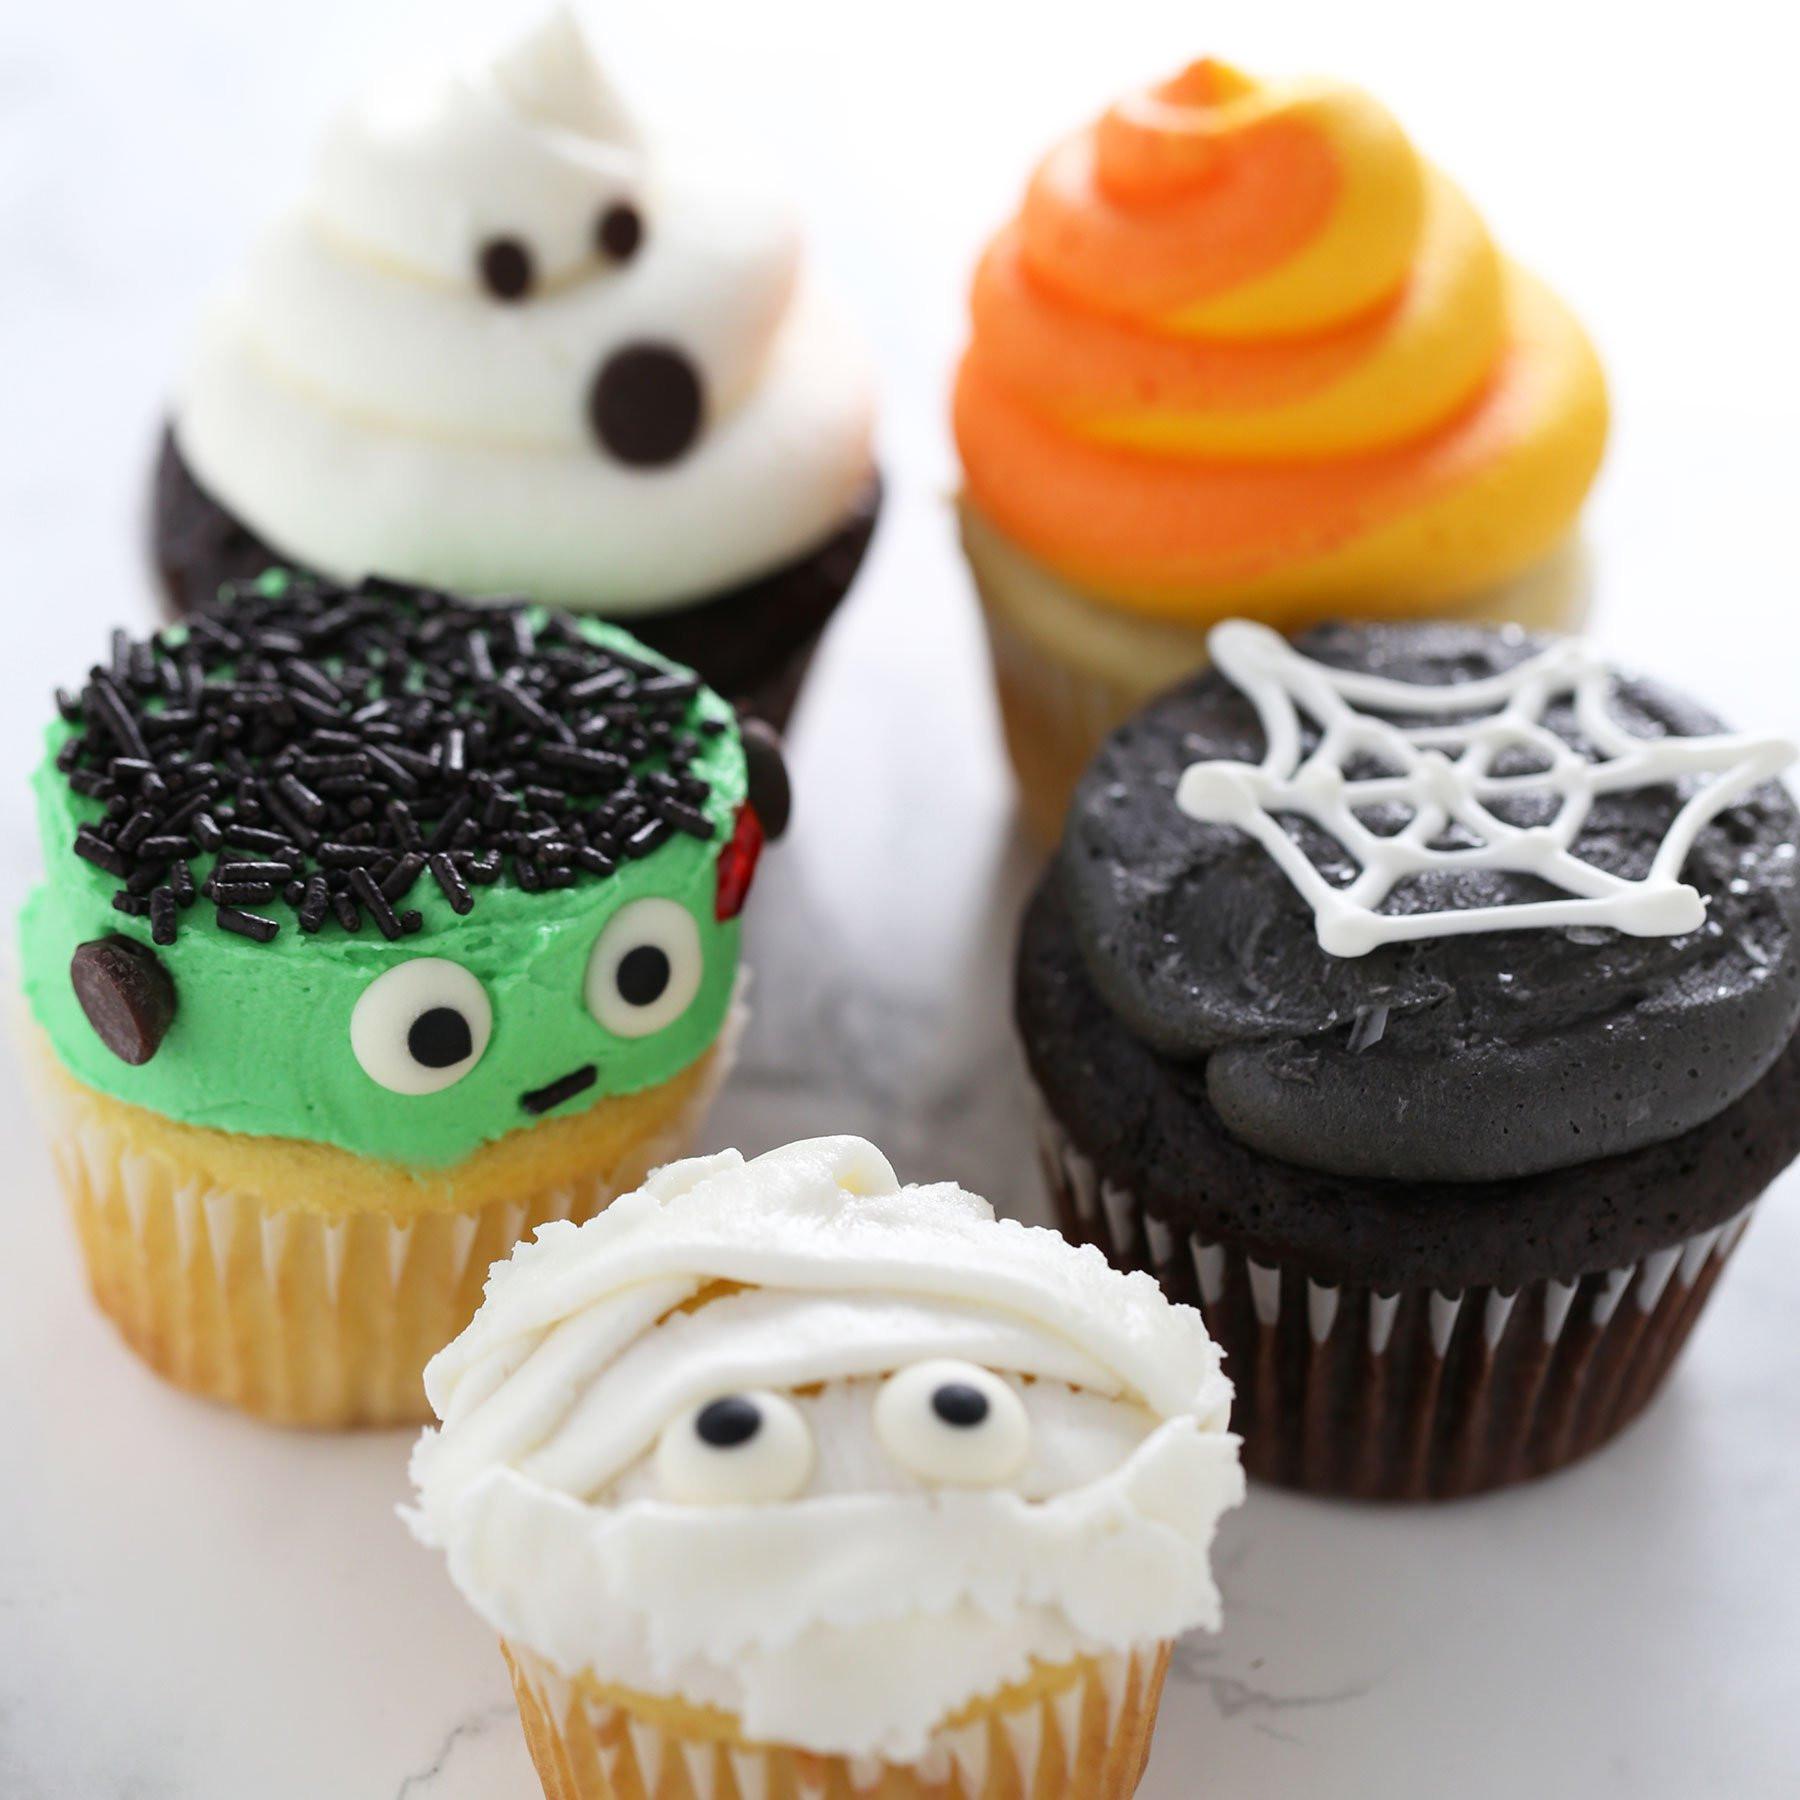 Cupcakes De Halloween  How to Make Halloween Cupcakes Handle the Heat